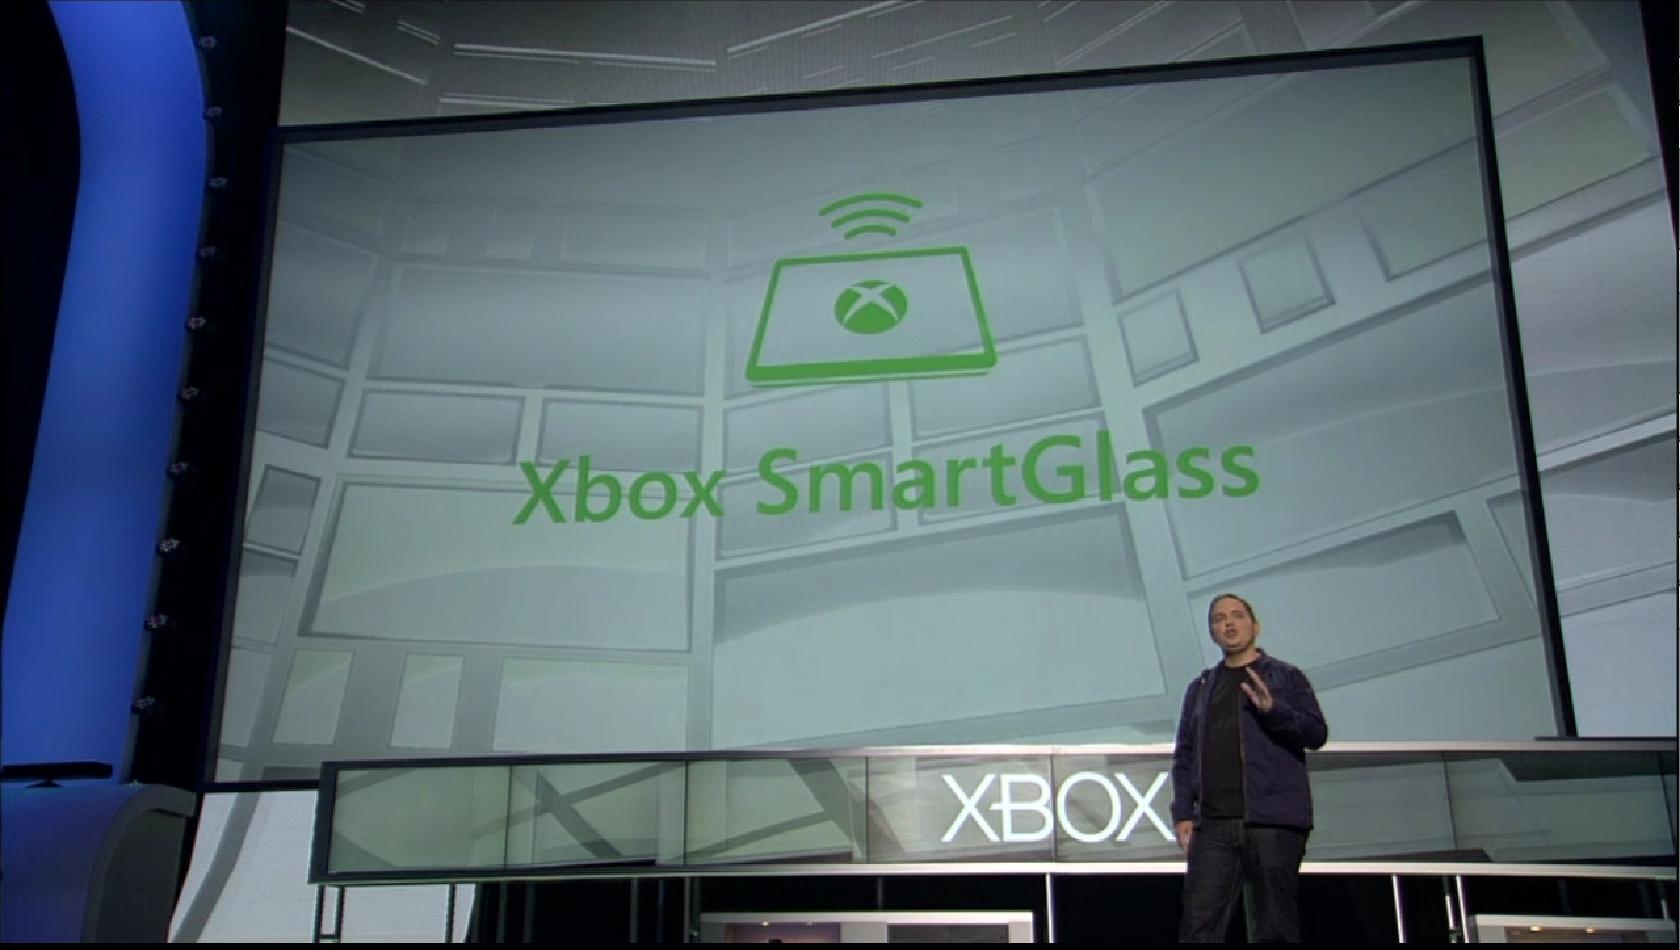 how to use smartglass on xbox 360